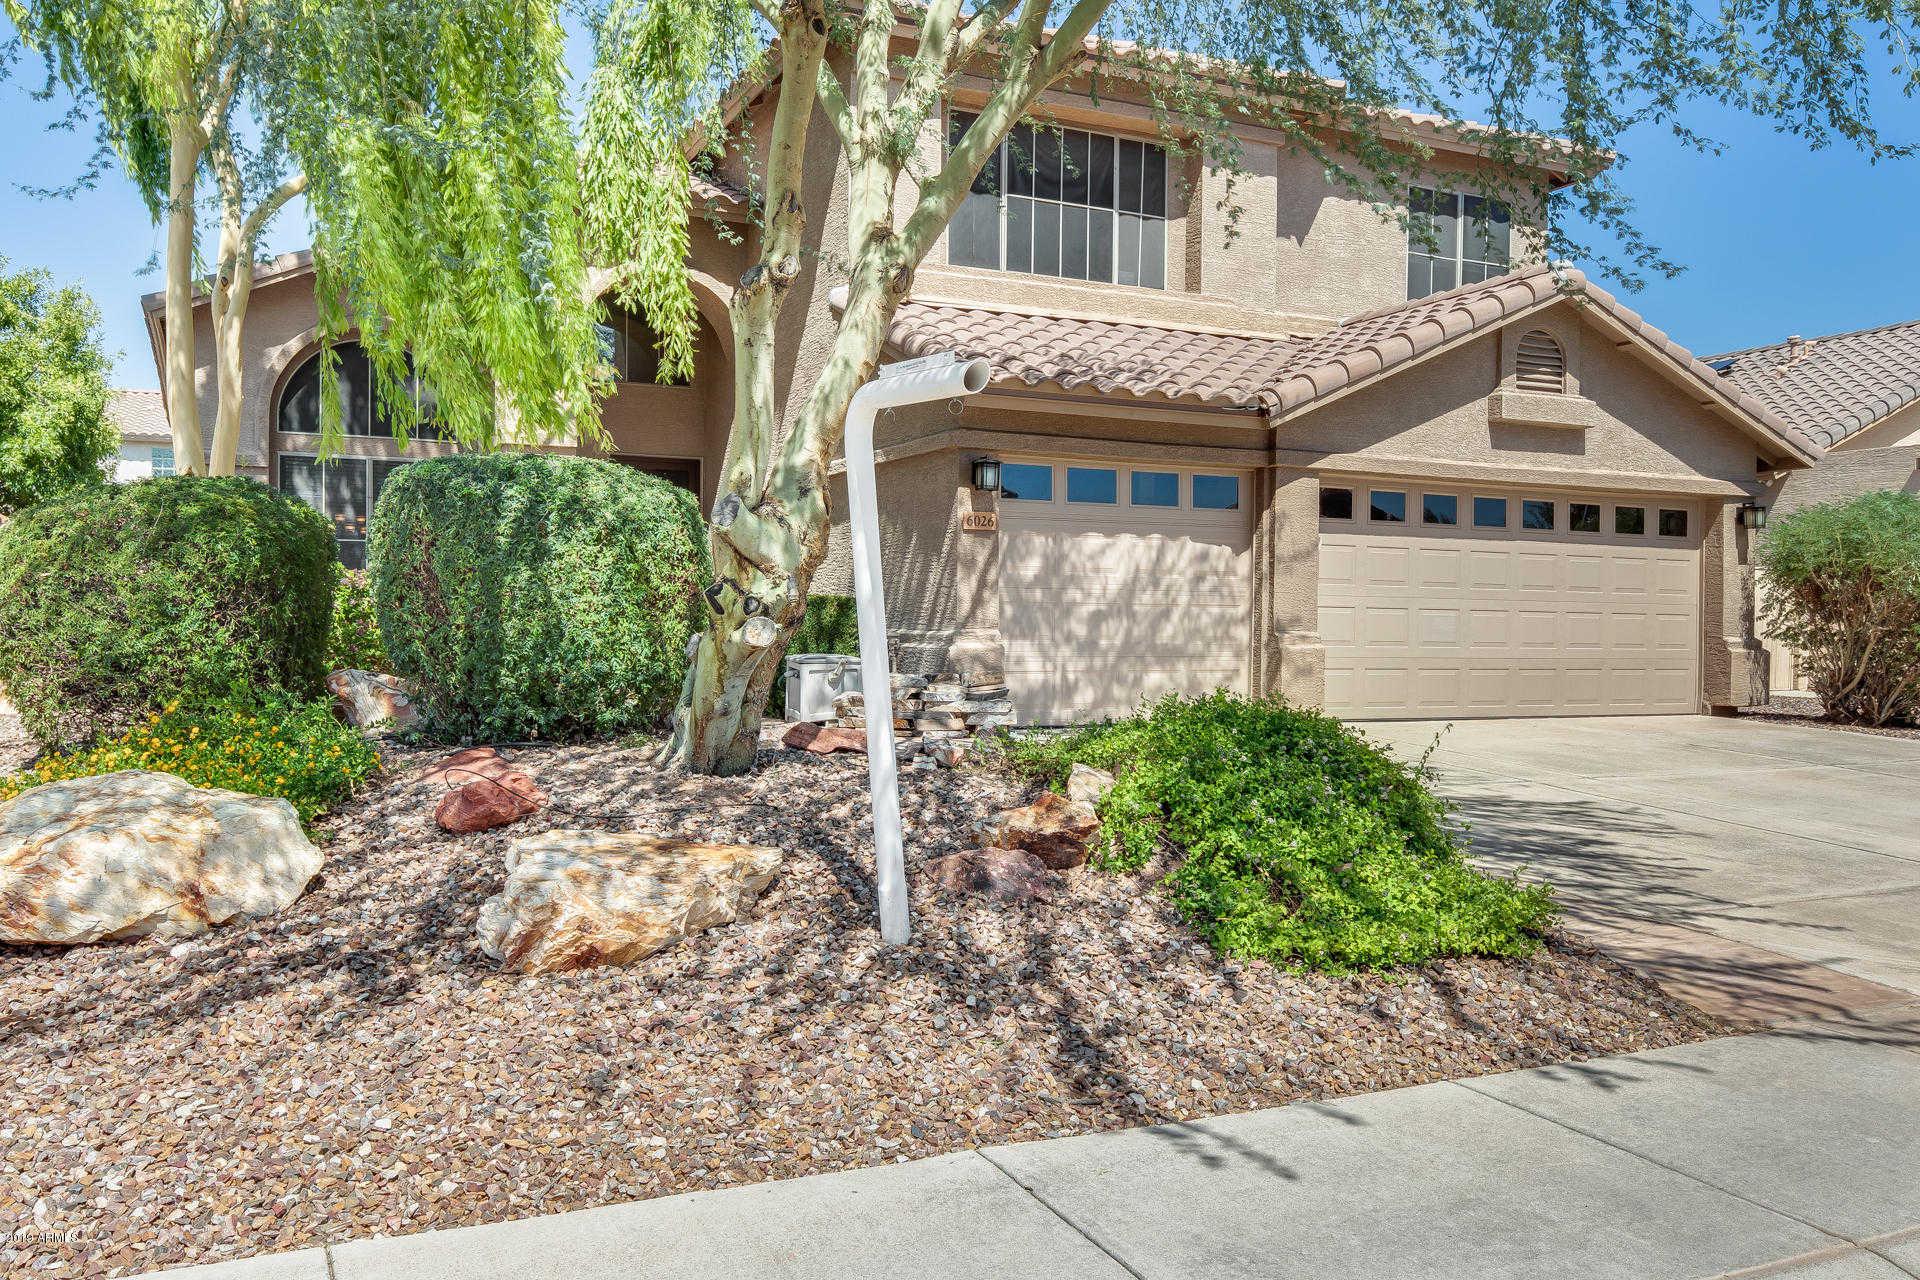 $405,000 - 5Br/3Ba - Home for Sale in Coppercrest, Glendale